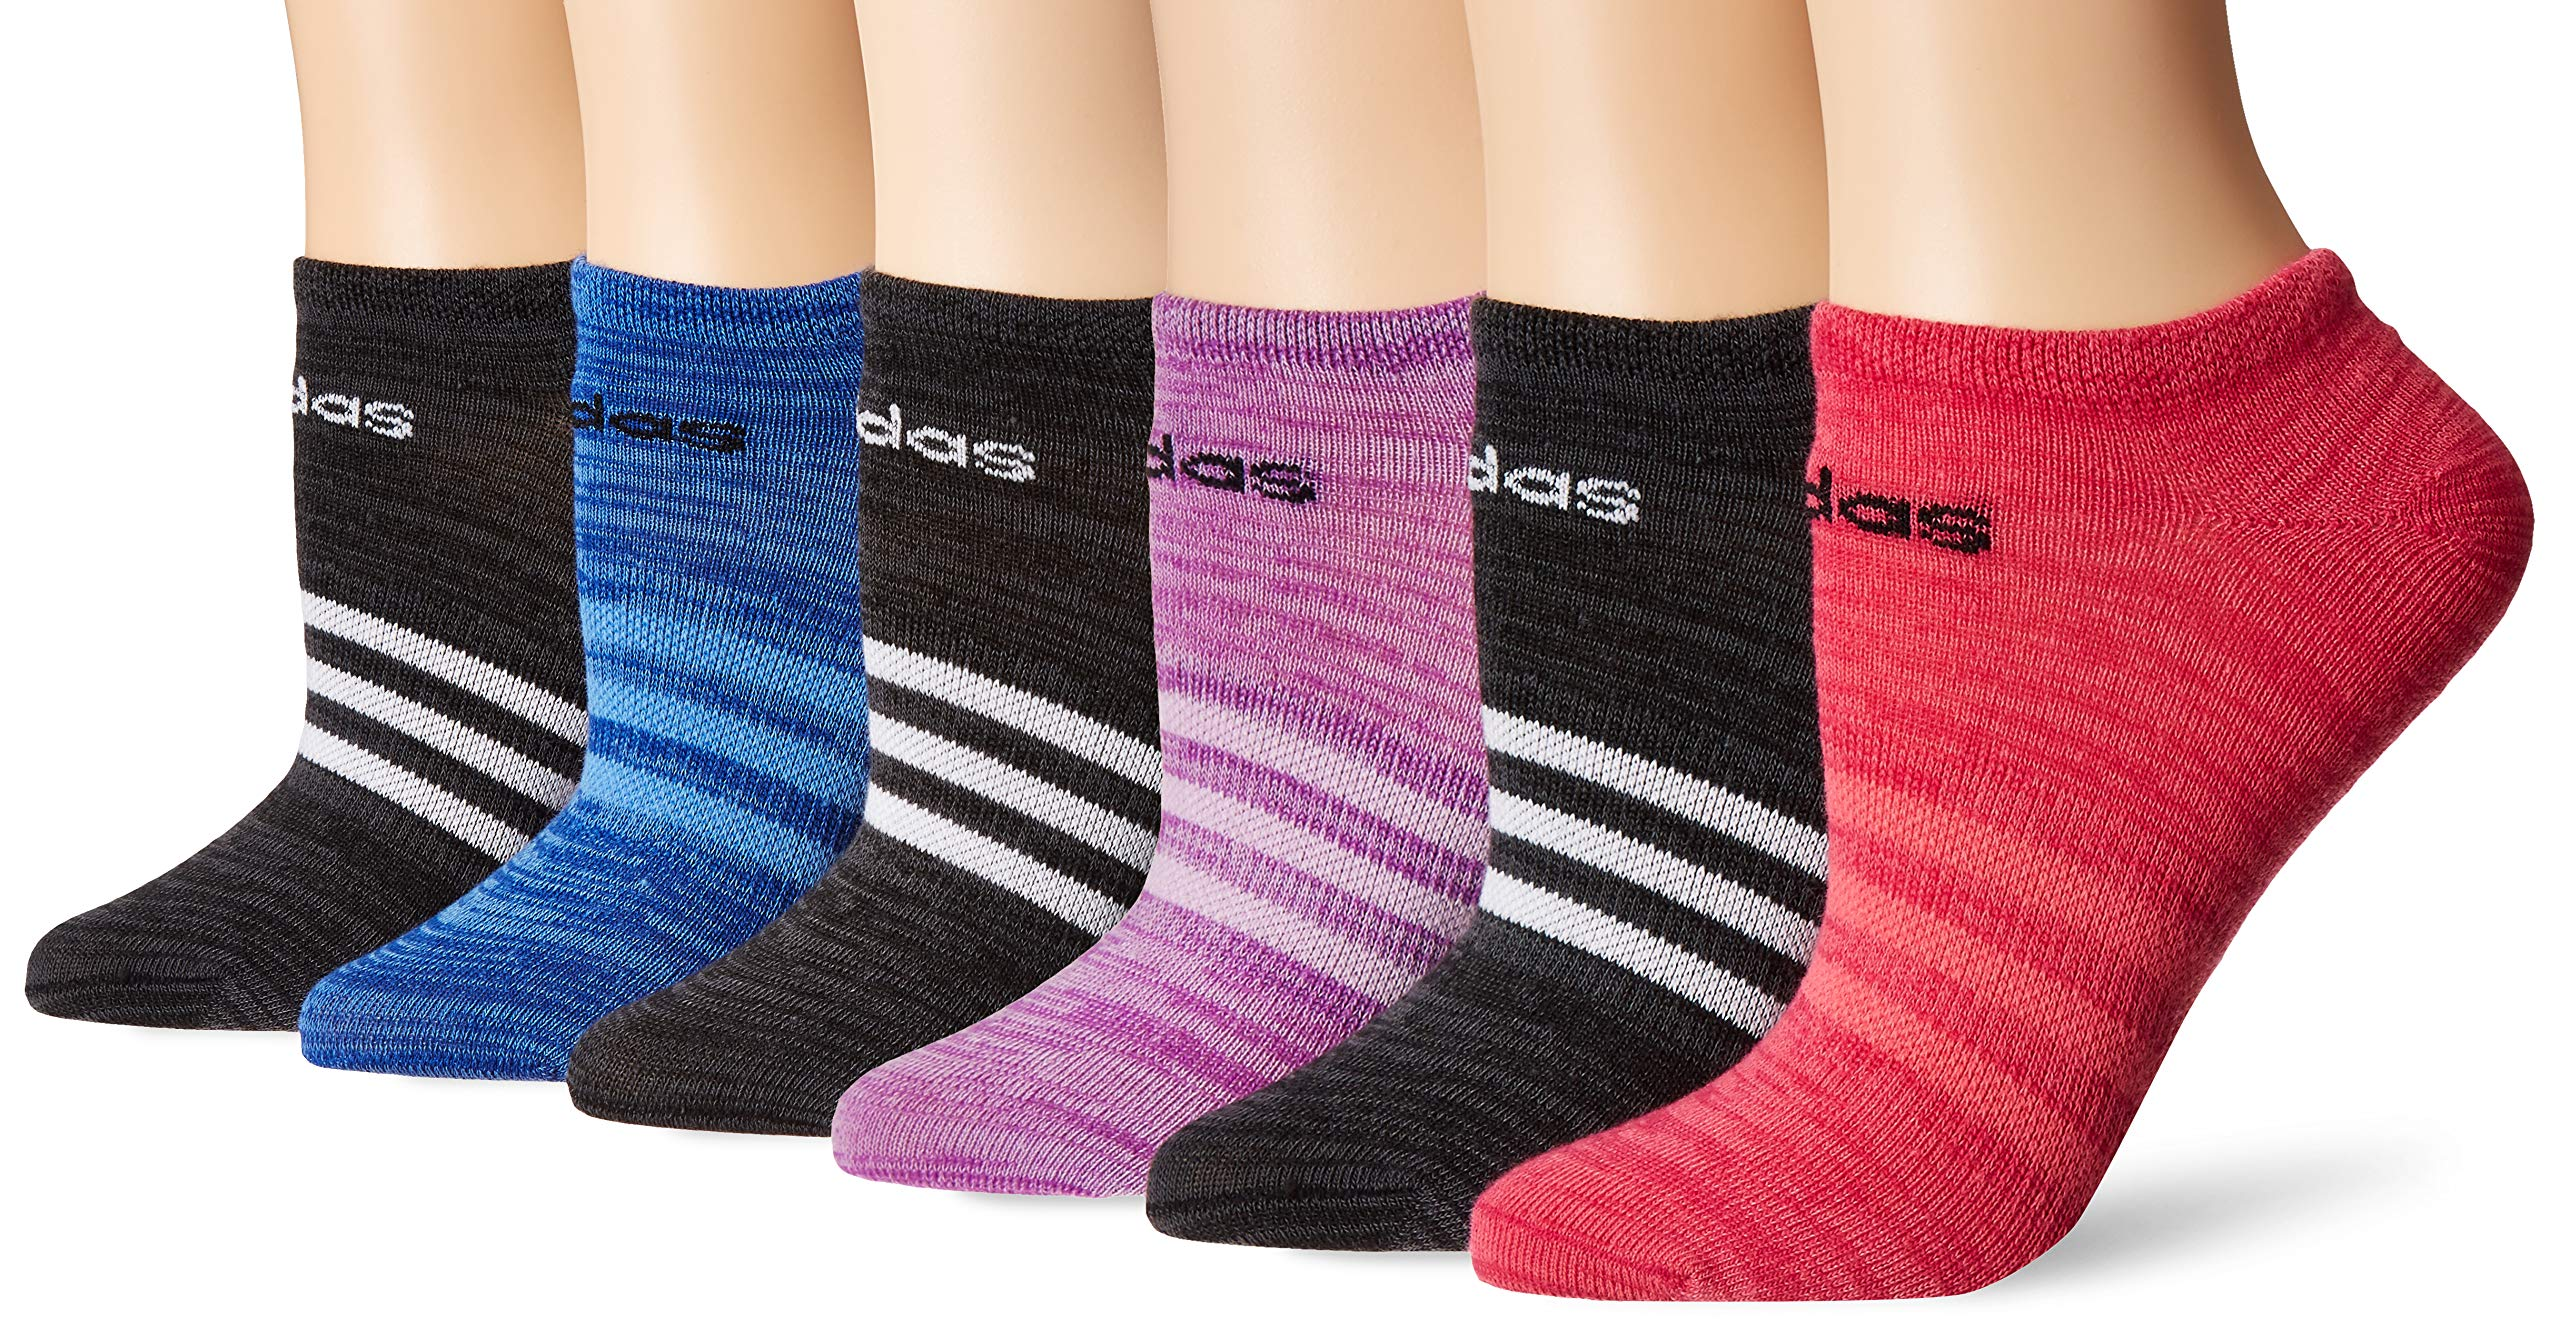 adidas Superlite No Show Socks (6 Pack), Black-Grey Six Space Dye/White by adidas